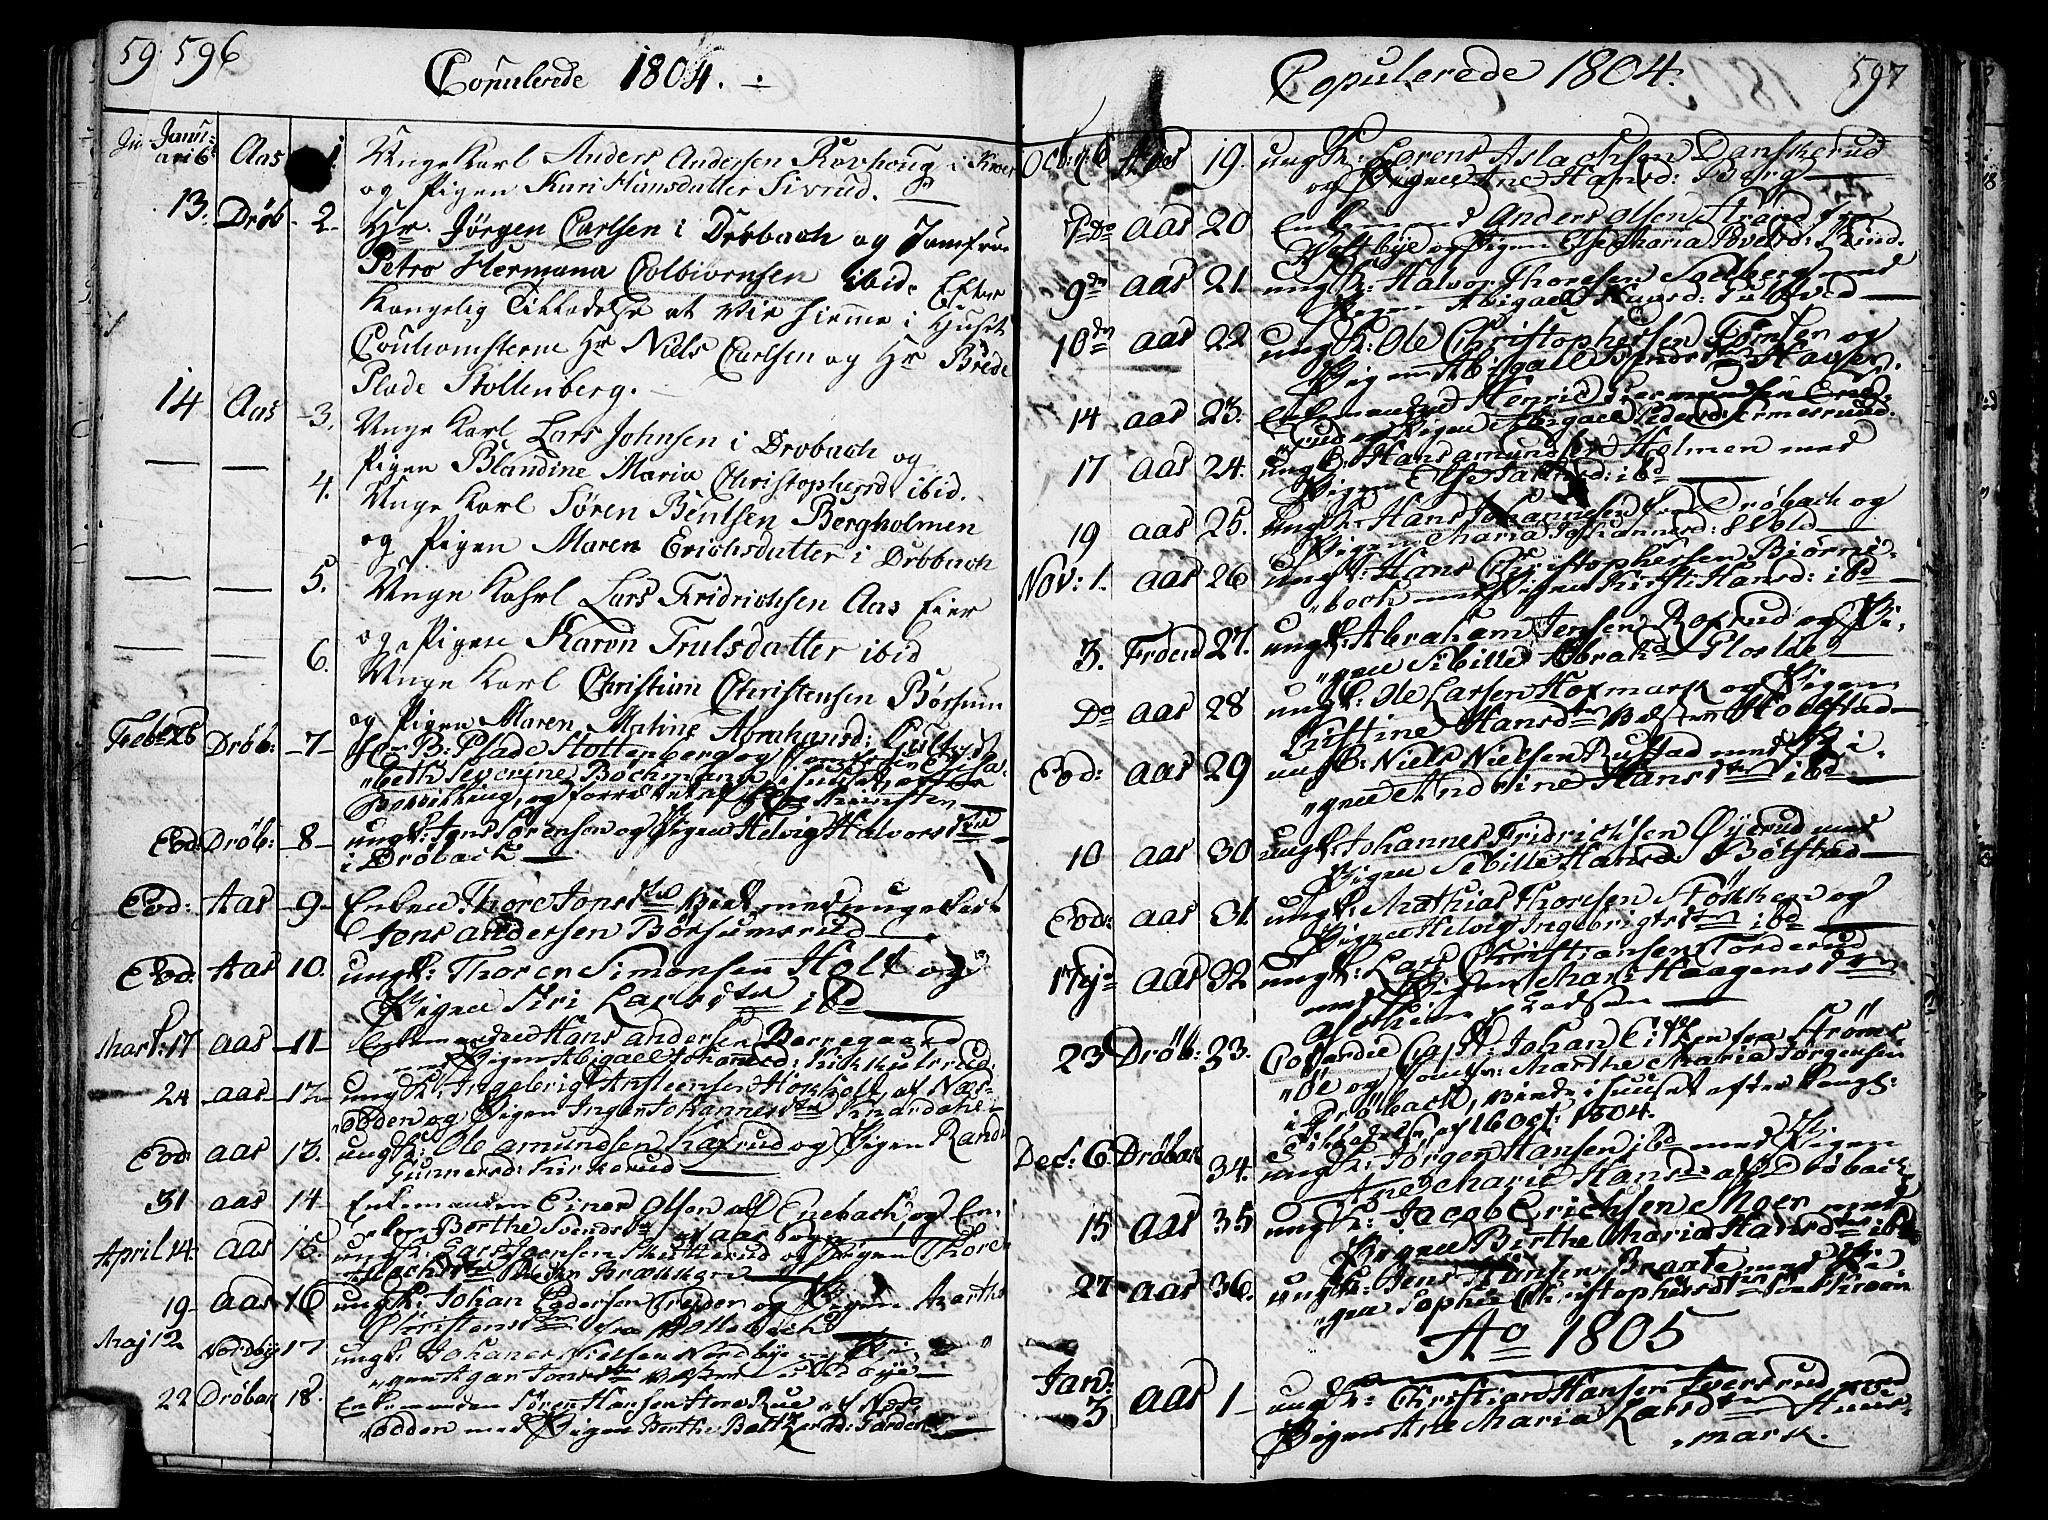 SAO, Ås prestekontor Kirkebøker, F/Fa/L0002: Ministerialbok nr. I 2, 1778-1813, s. 596-597